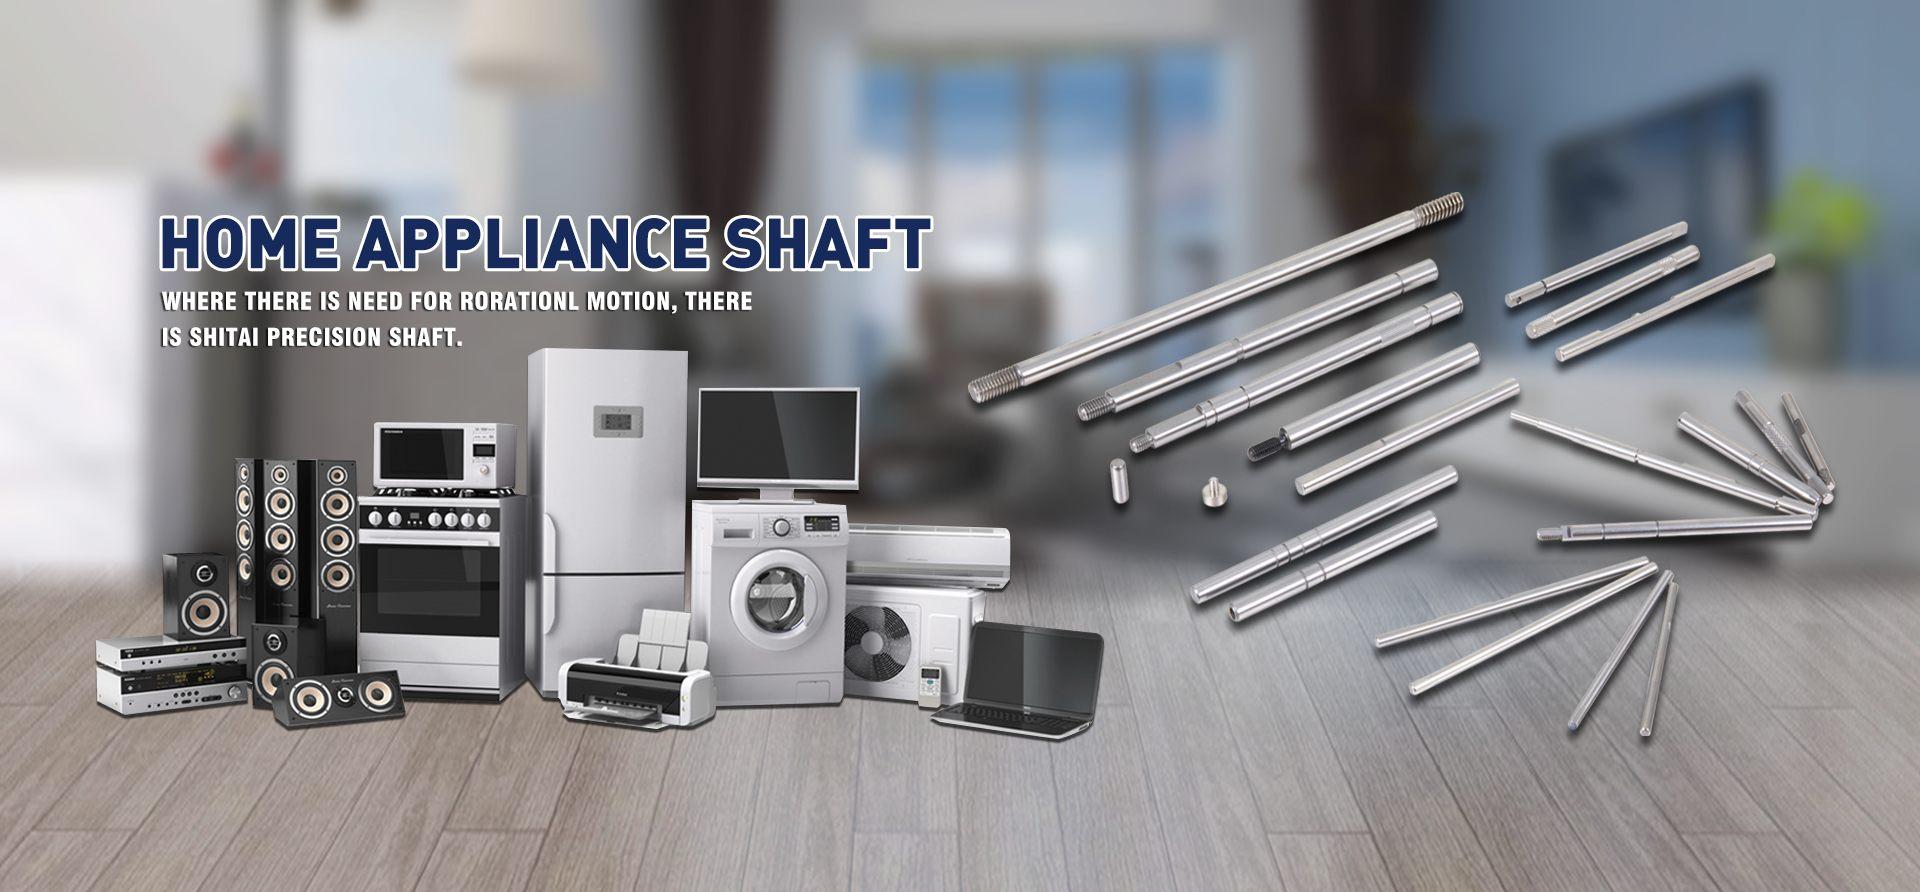 Home Appliance Shaft